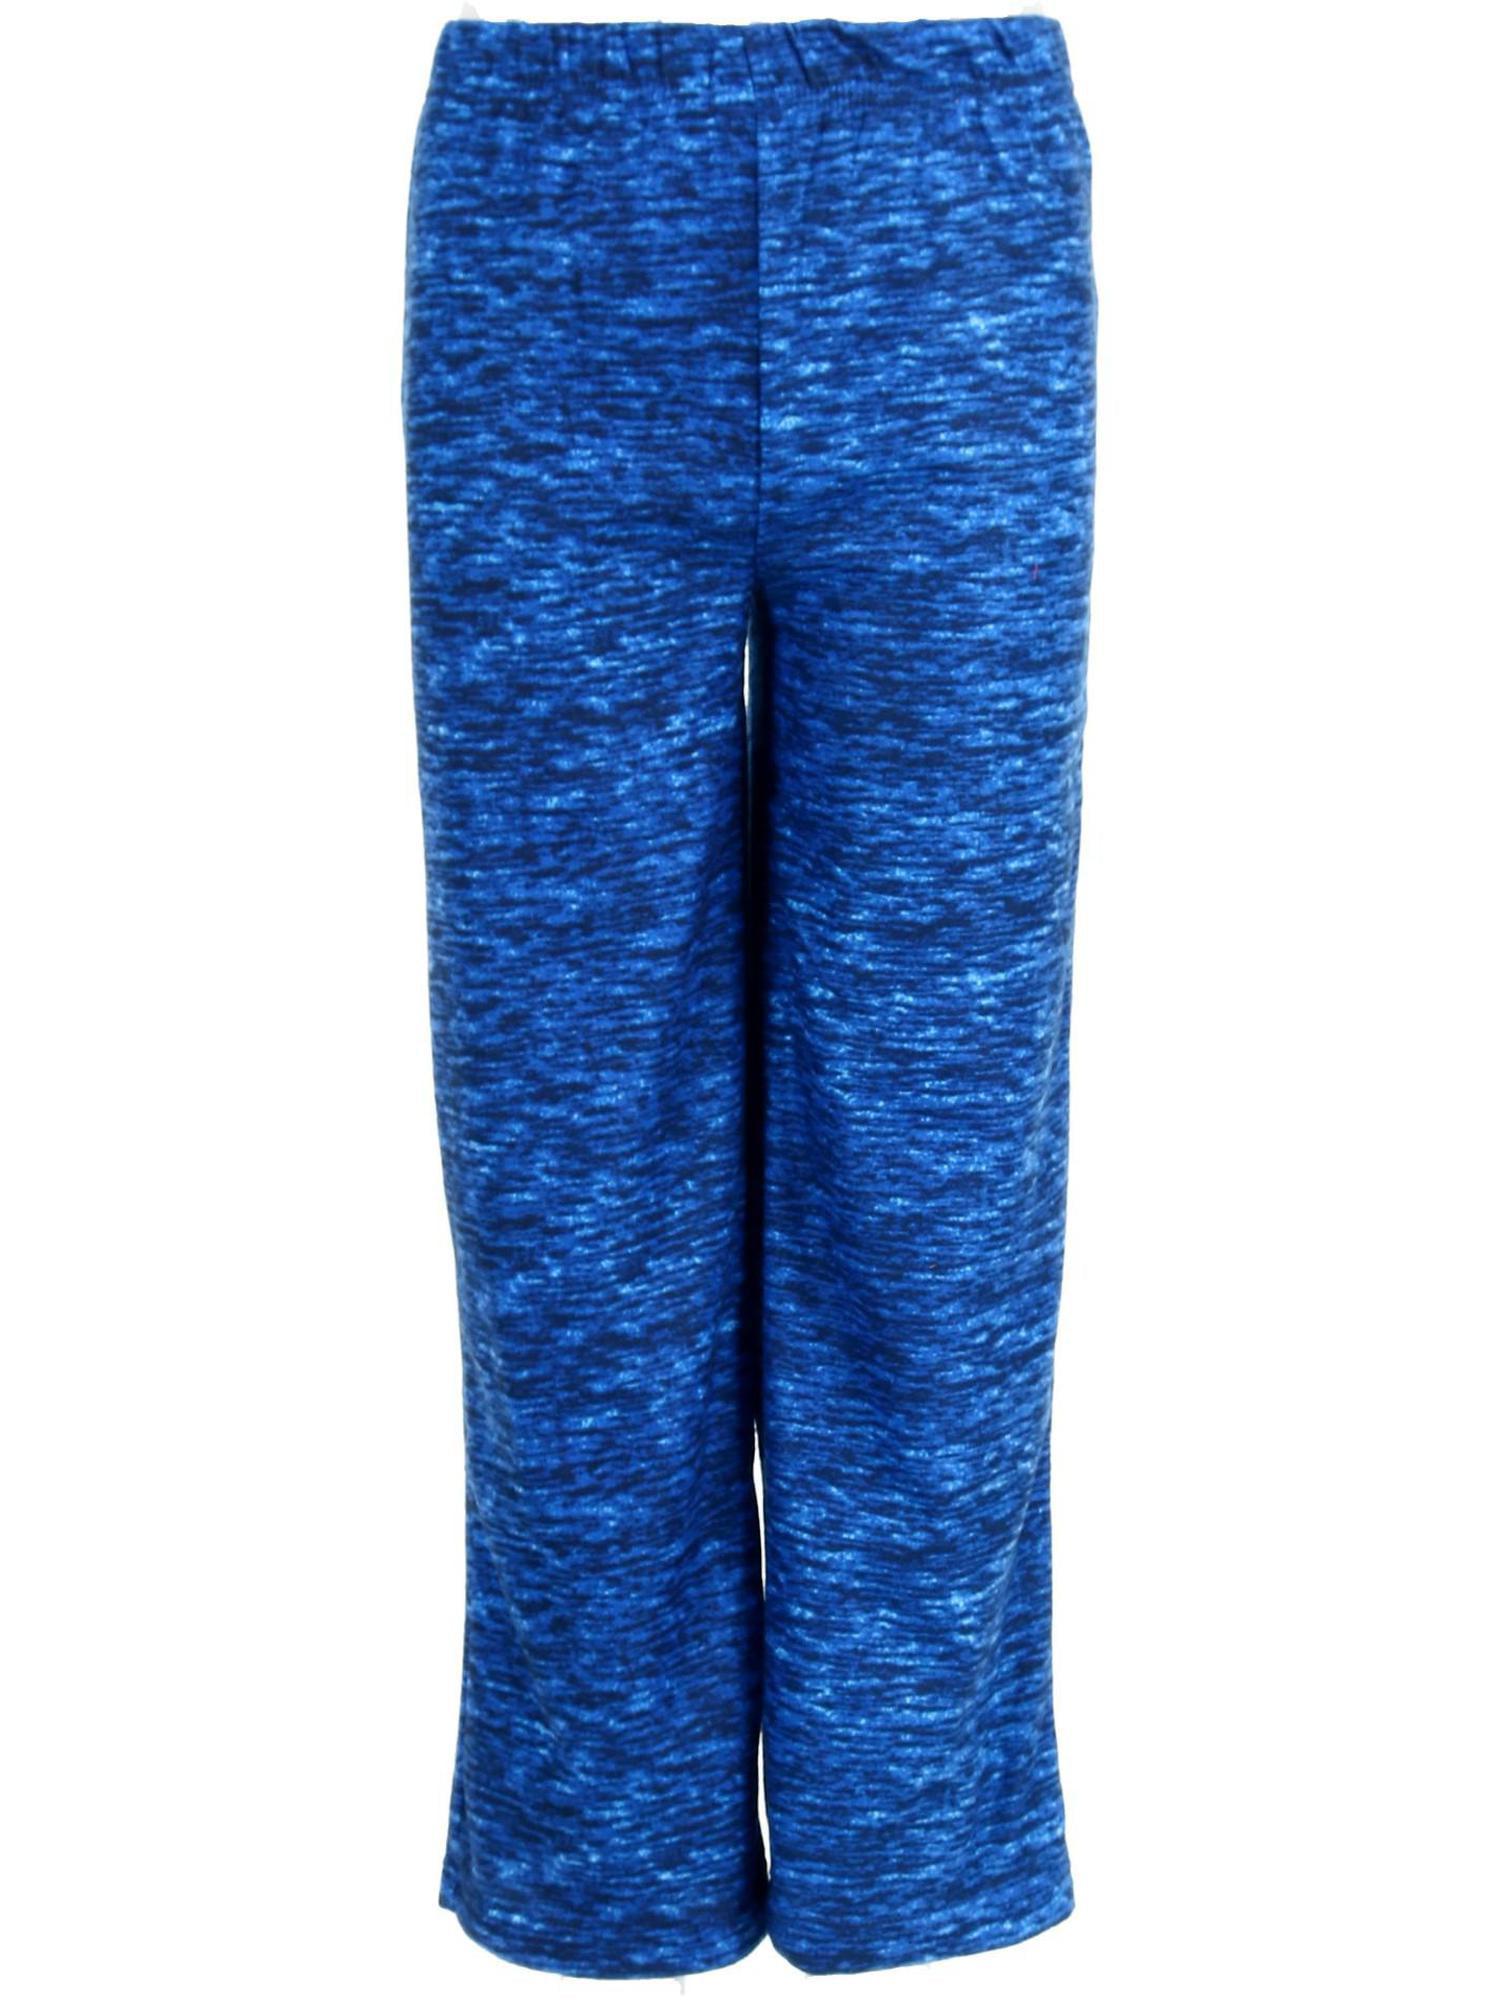 Boy's Micro Fleece Pajama Lounge Pants